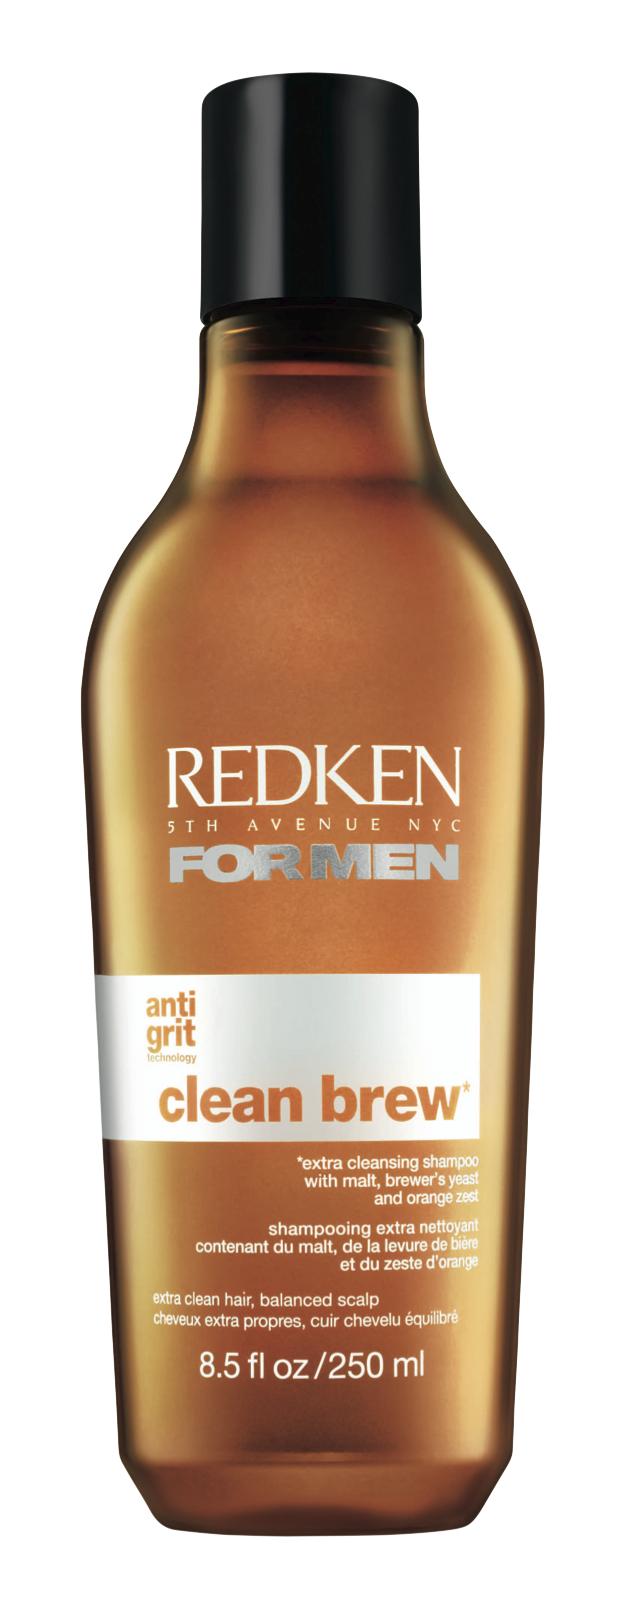 RFM_Clean Brew_high res copy.jpg